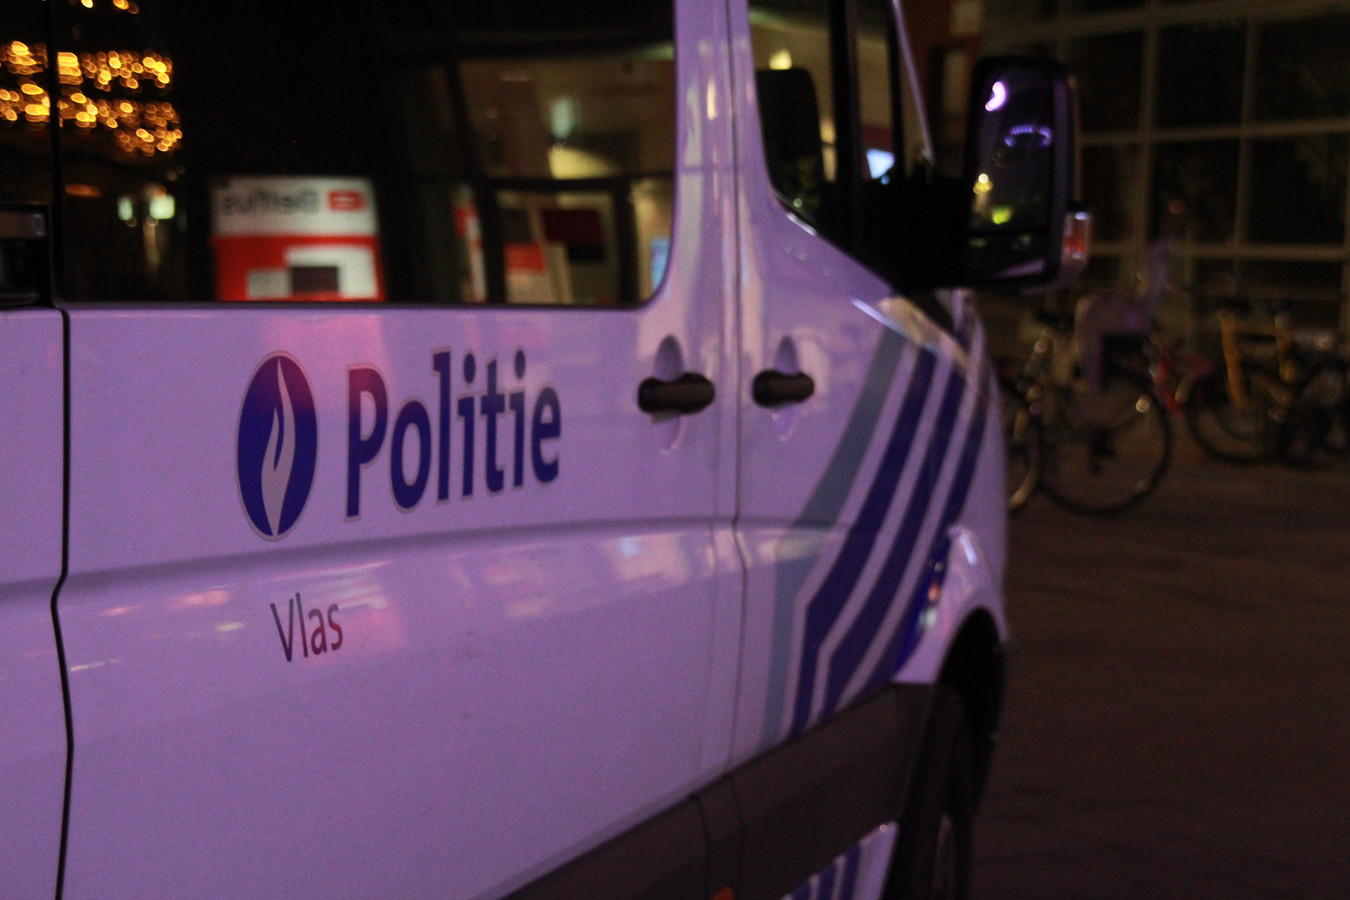 Politiezone Vlas (Kortrijk, Kuurne, Lendelede)